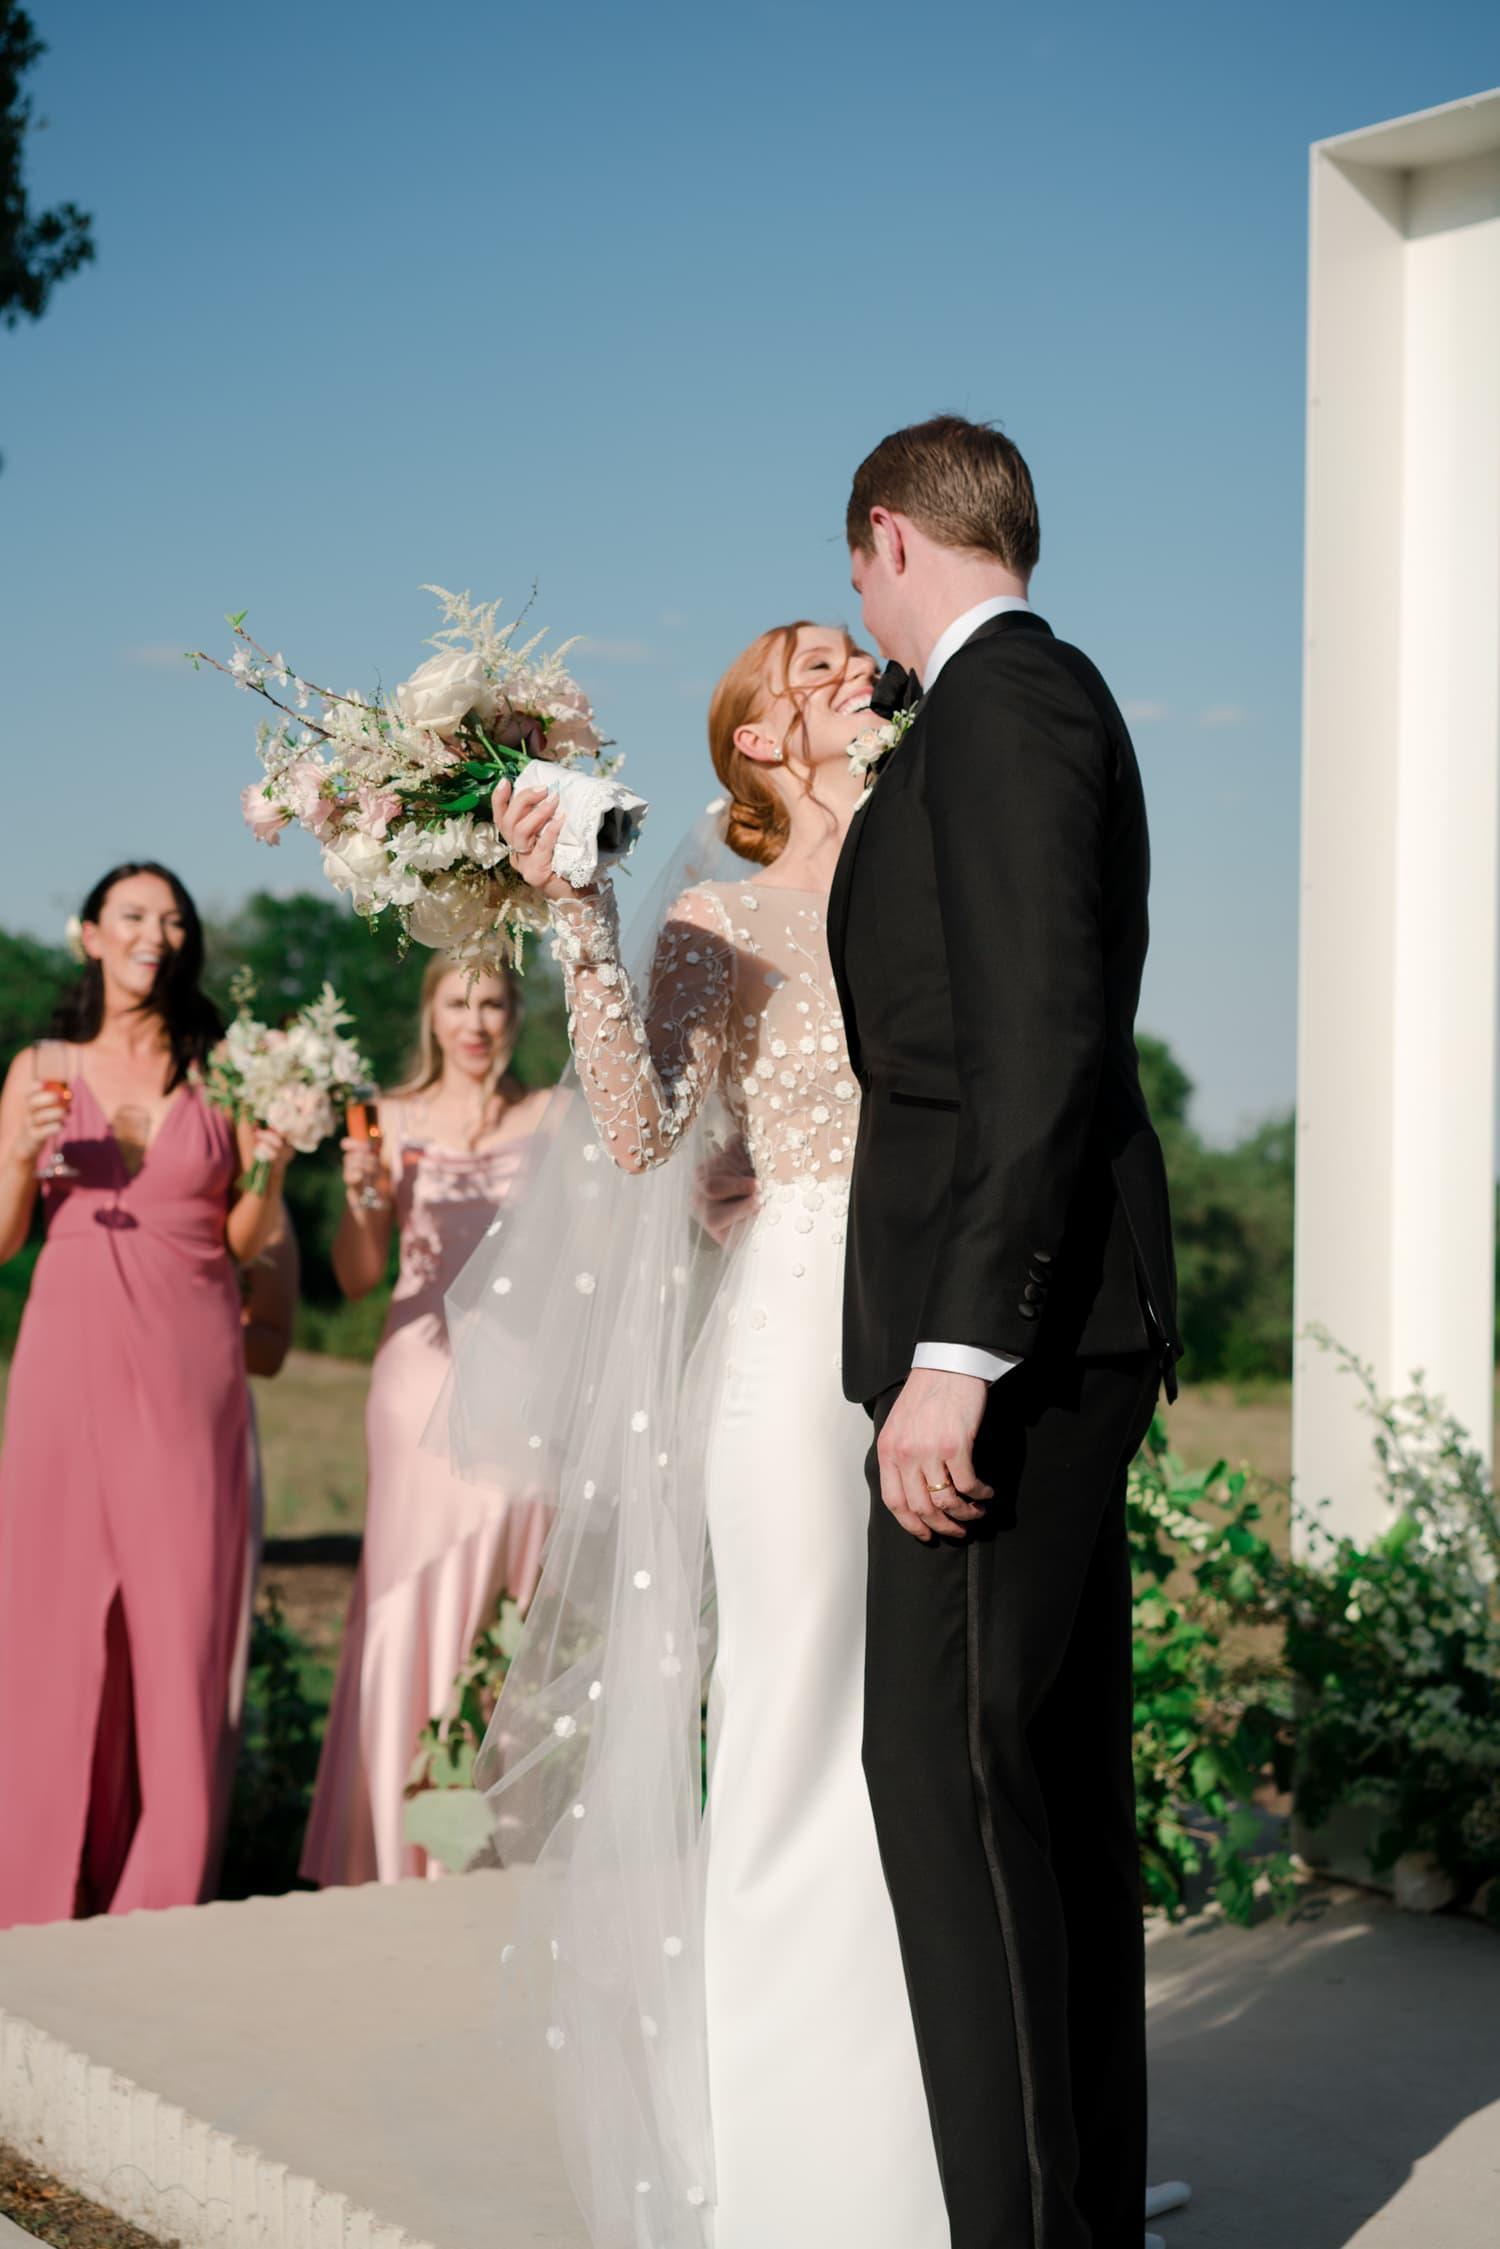 PROSPECT_HOUSE_WEDDING_AUSTIN_TX_MATTHEW_MOORE-00542.jpg